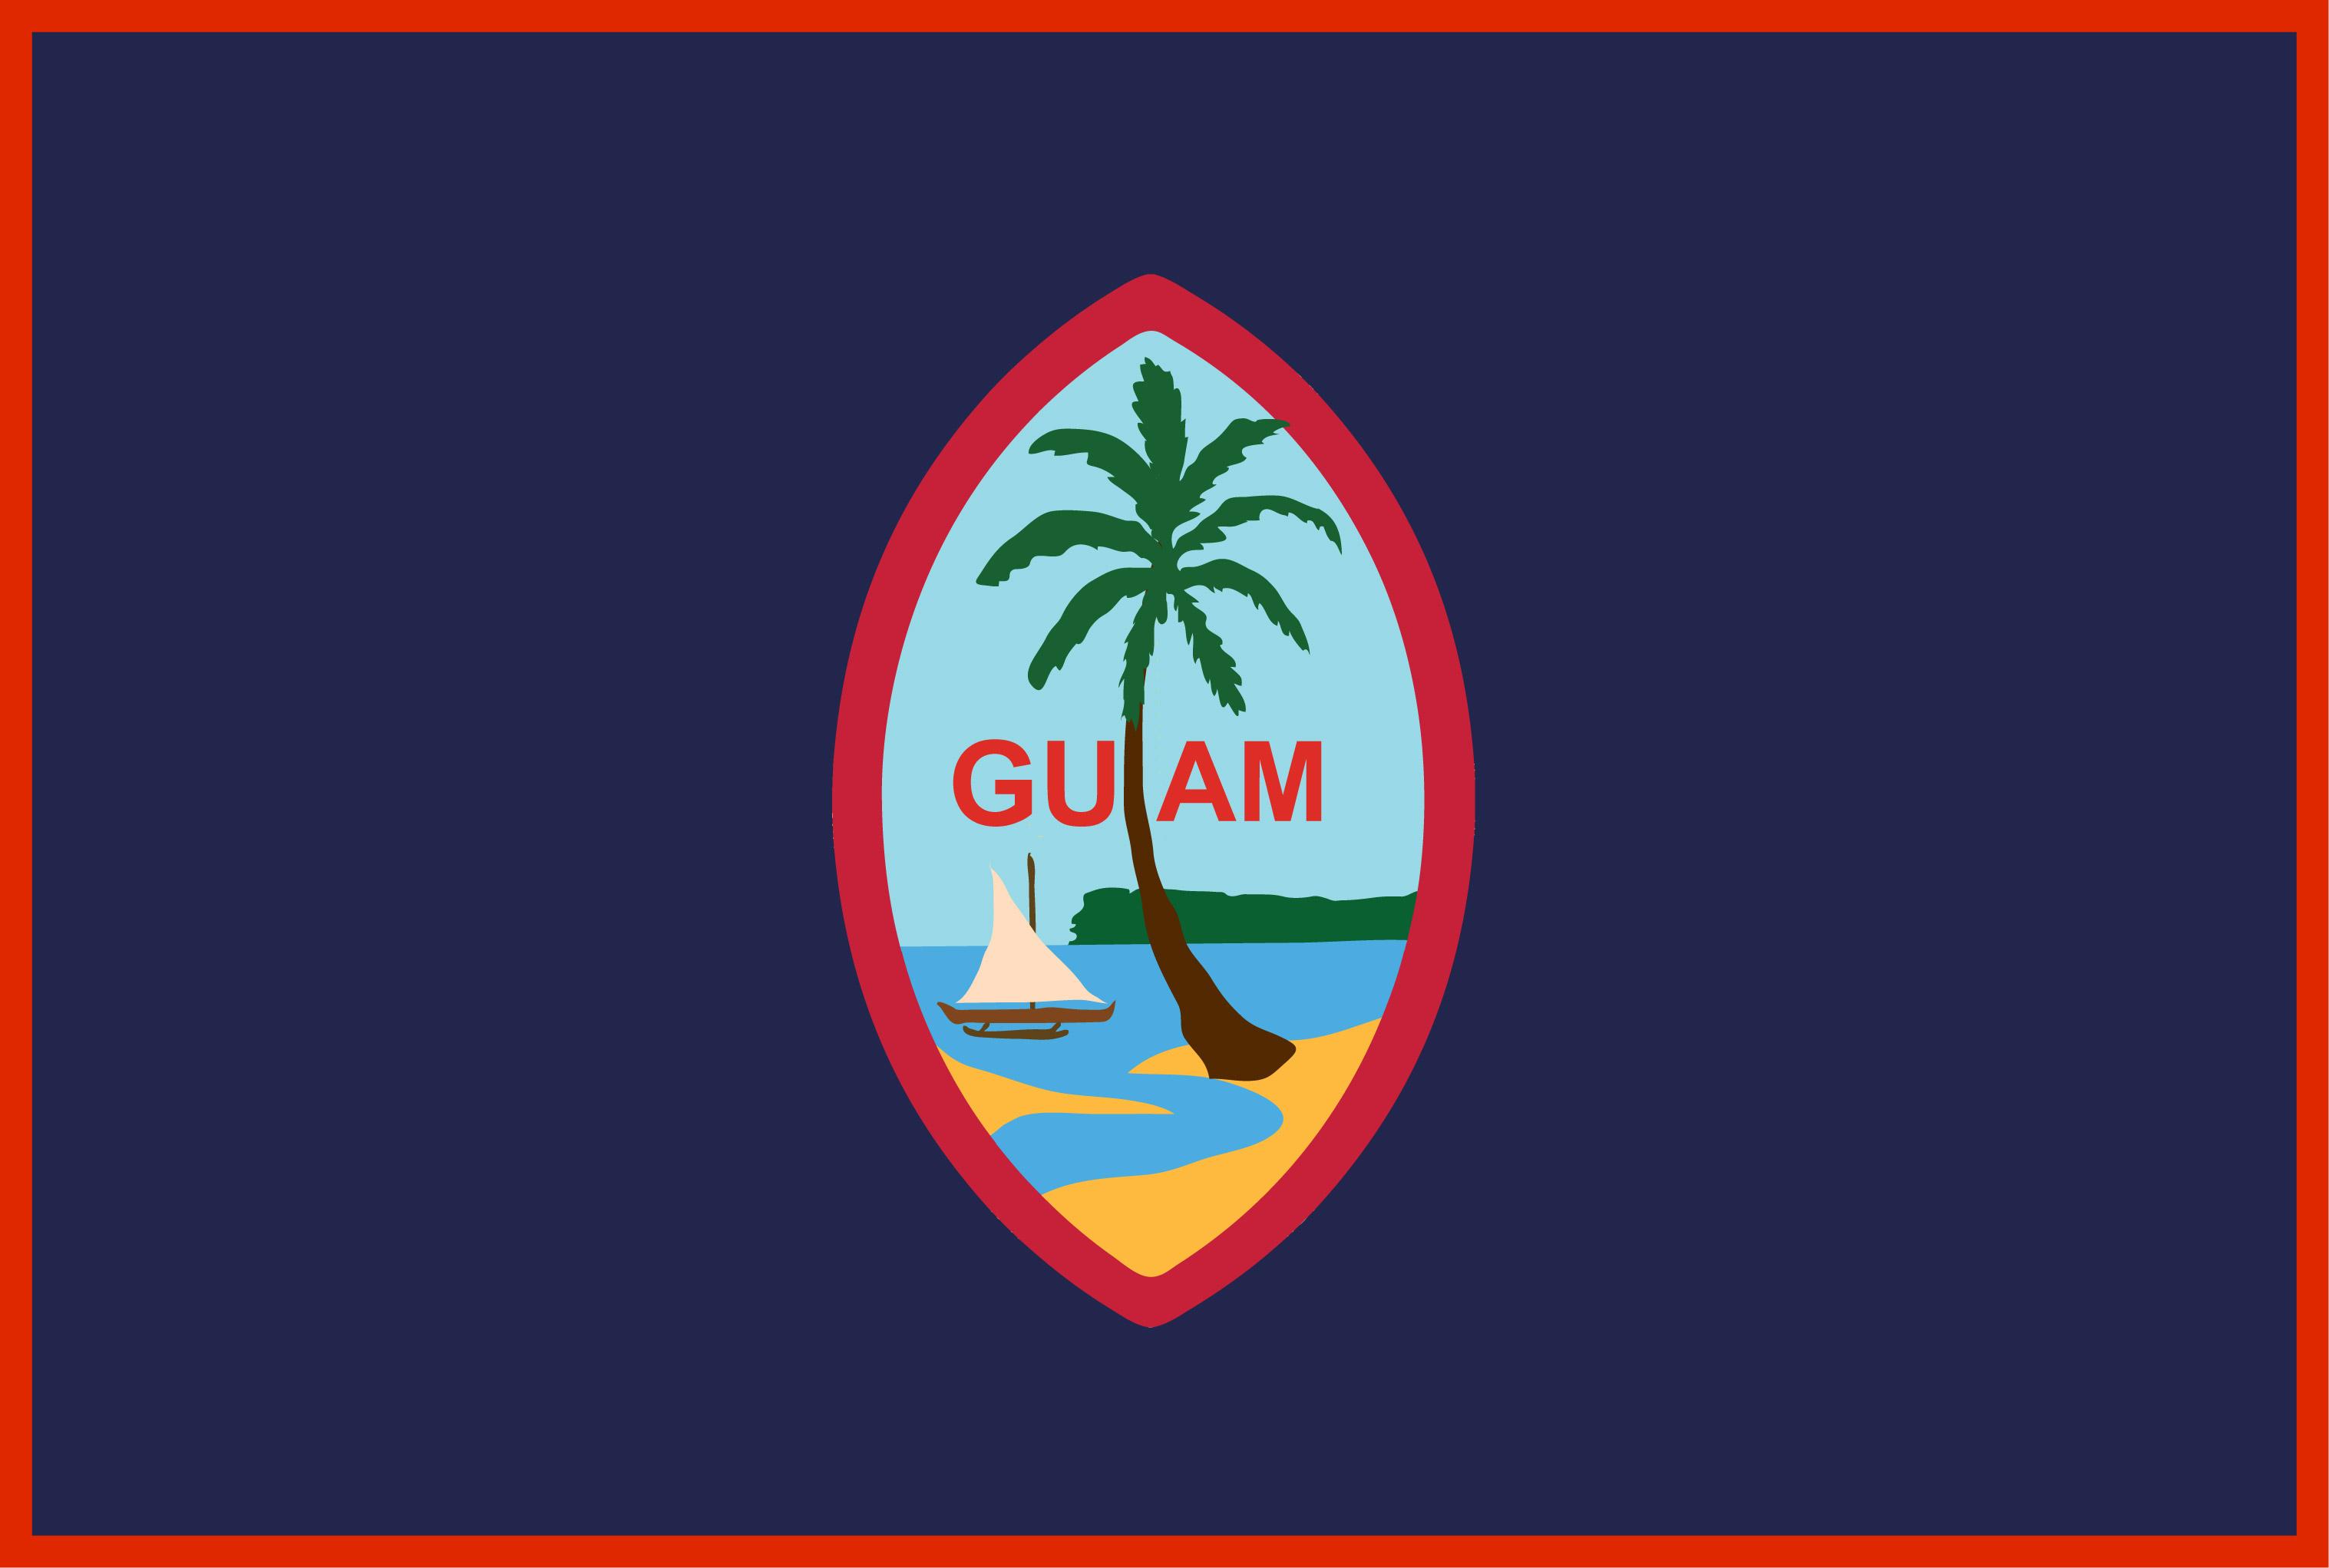 Guam US Territory Flags